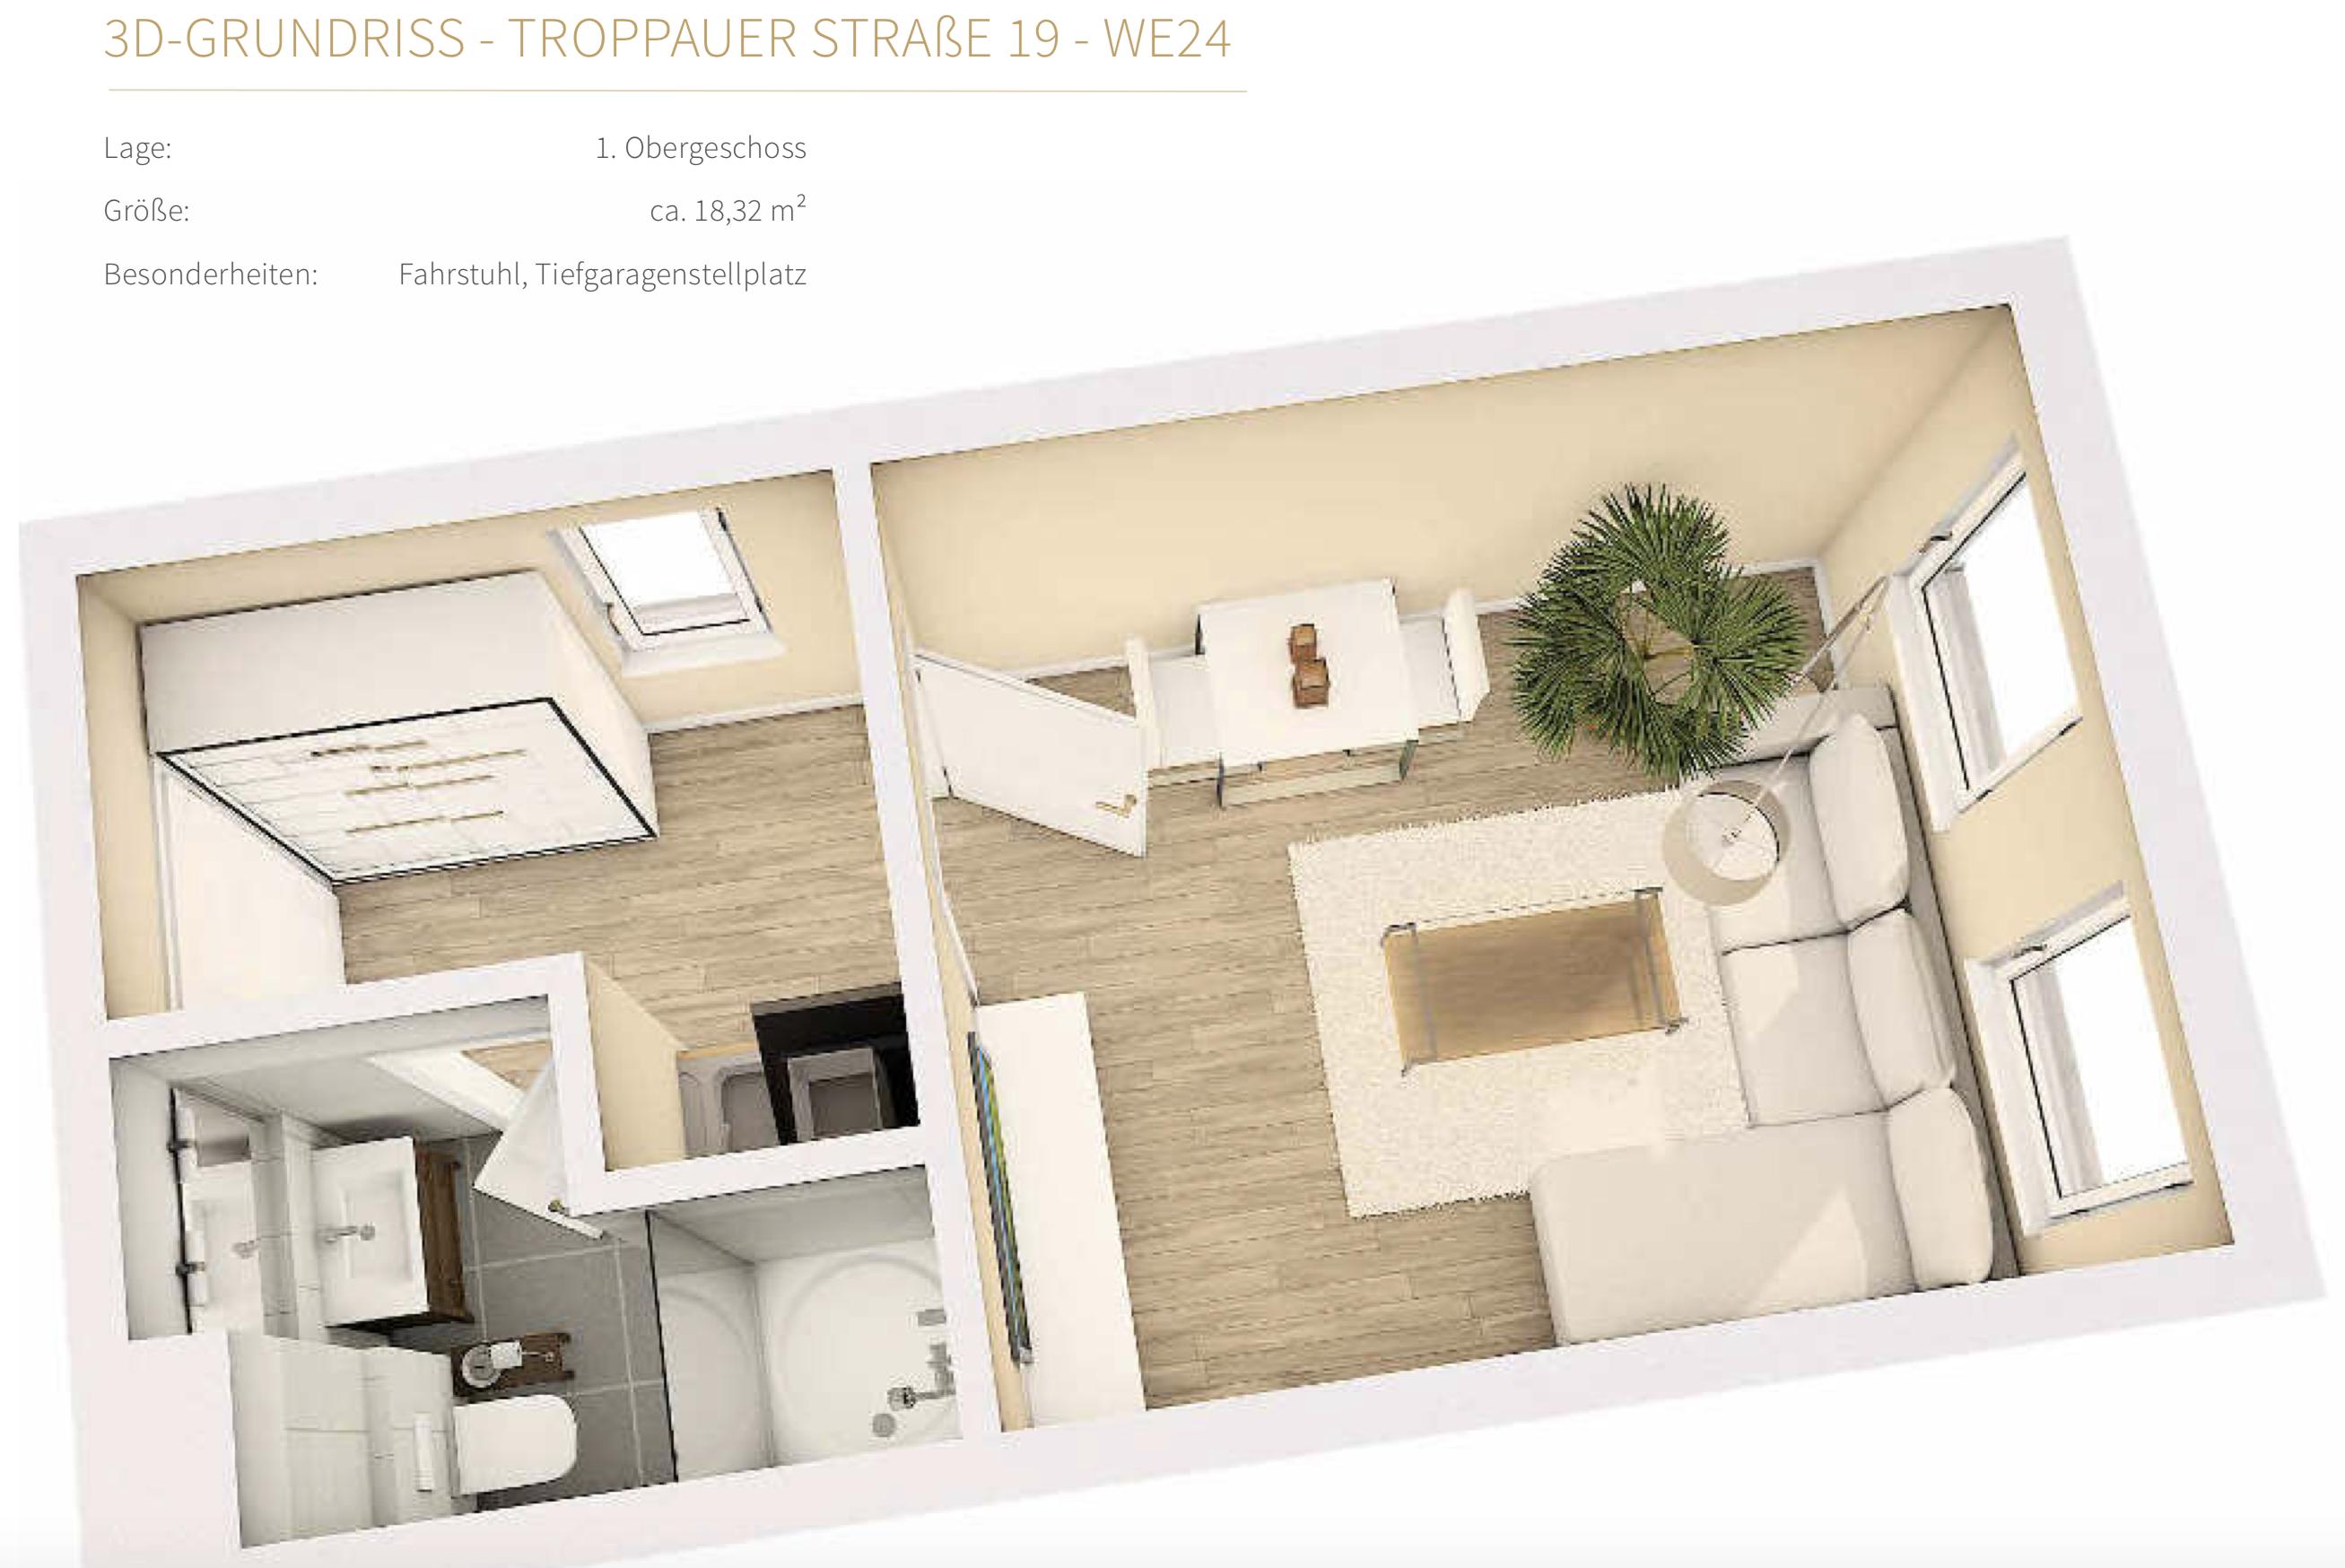 1 zimmer wohnung im 1 obergeschoss immoanteil24. Black Bedroom Furniture Sets. Home Design Ideas